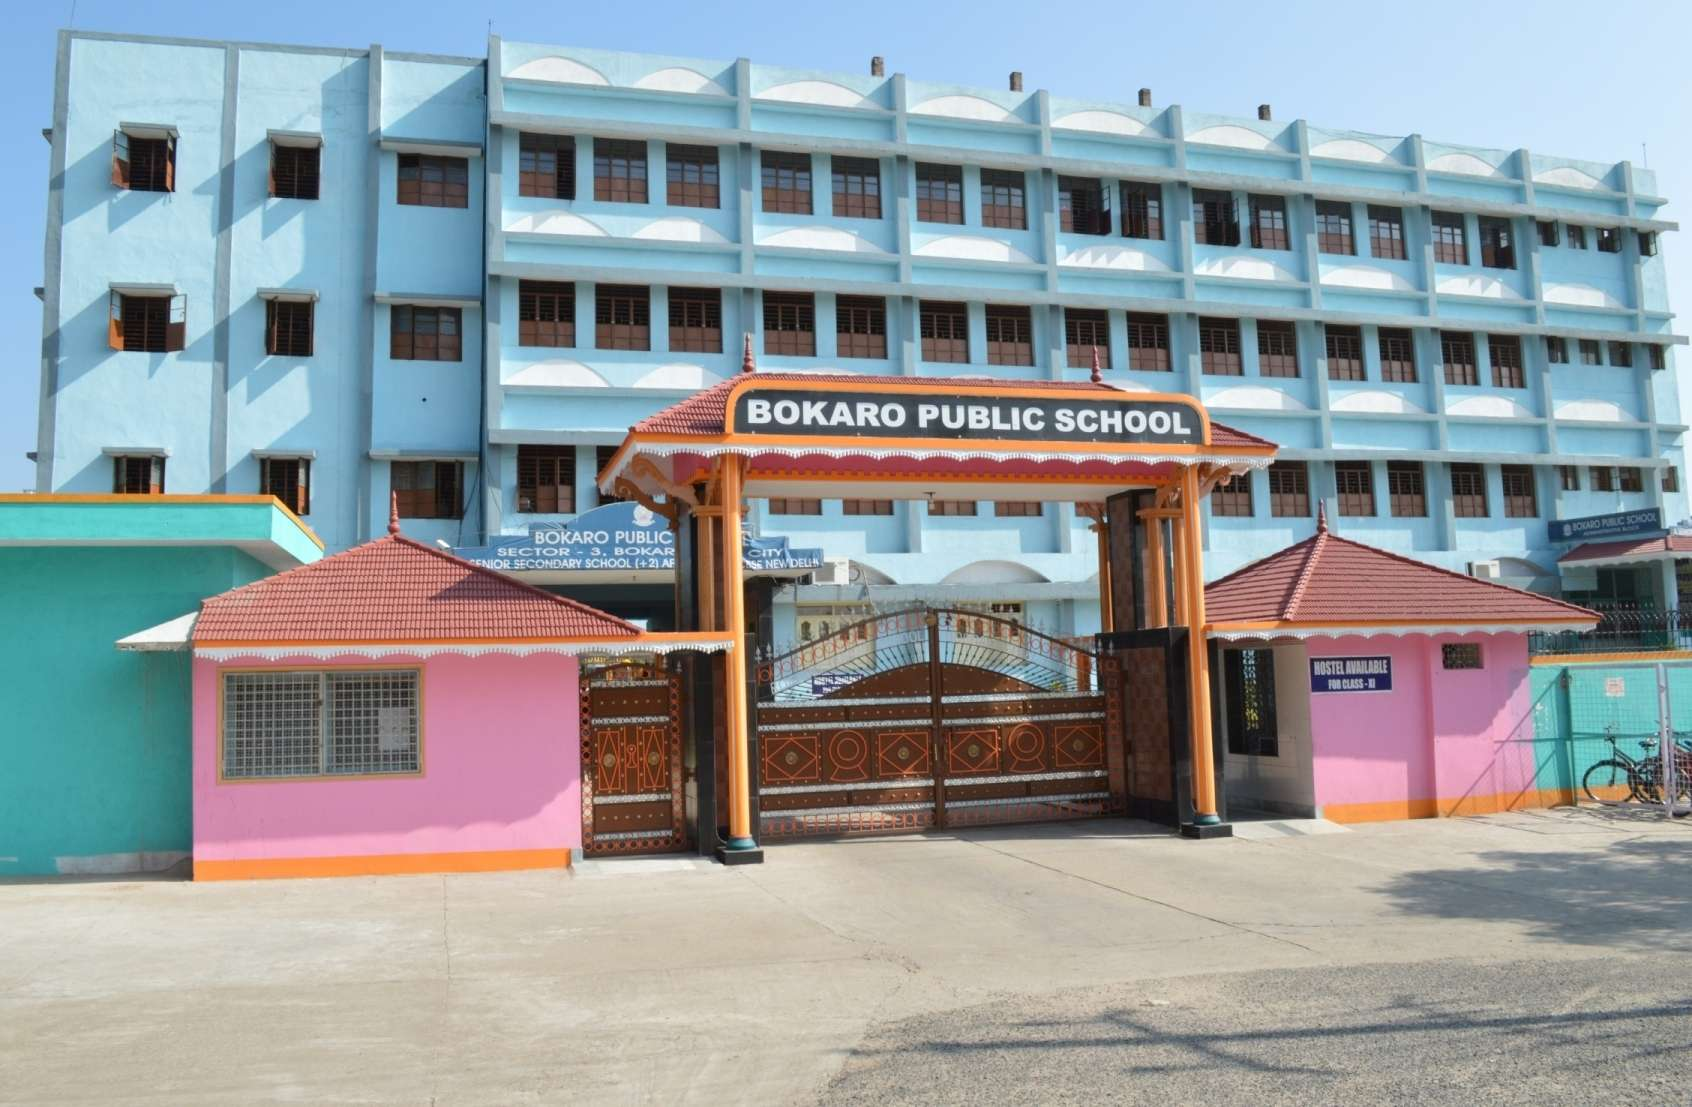 BOKARO PUBLIC SCHOOL SECTOR 3 C BOKARO STEEL CITY DISTT BOKARO JHARKHAND 3430197